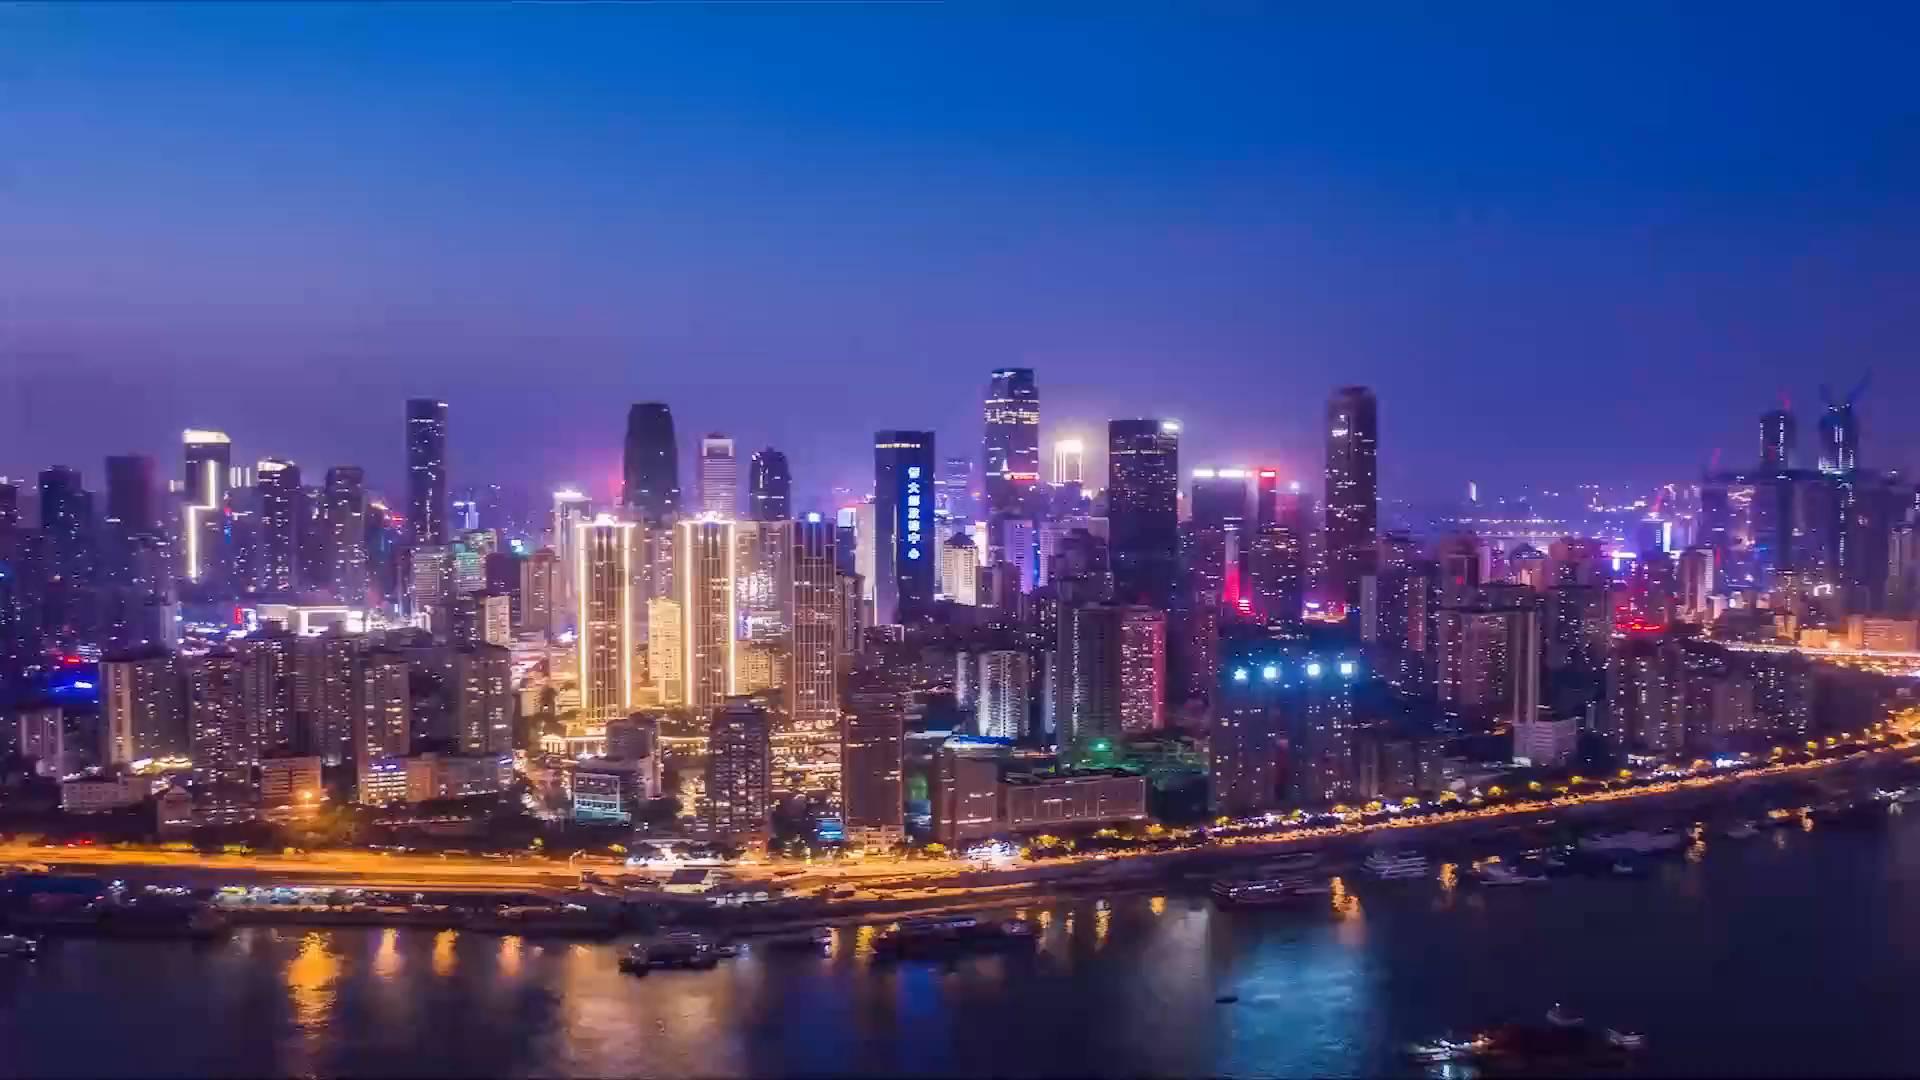 GLOBALink | China's mountain city, Chongqing develops high-rise economy